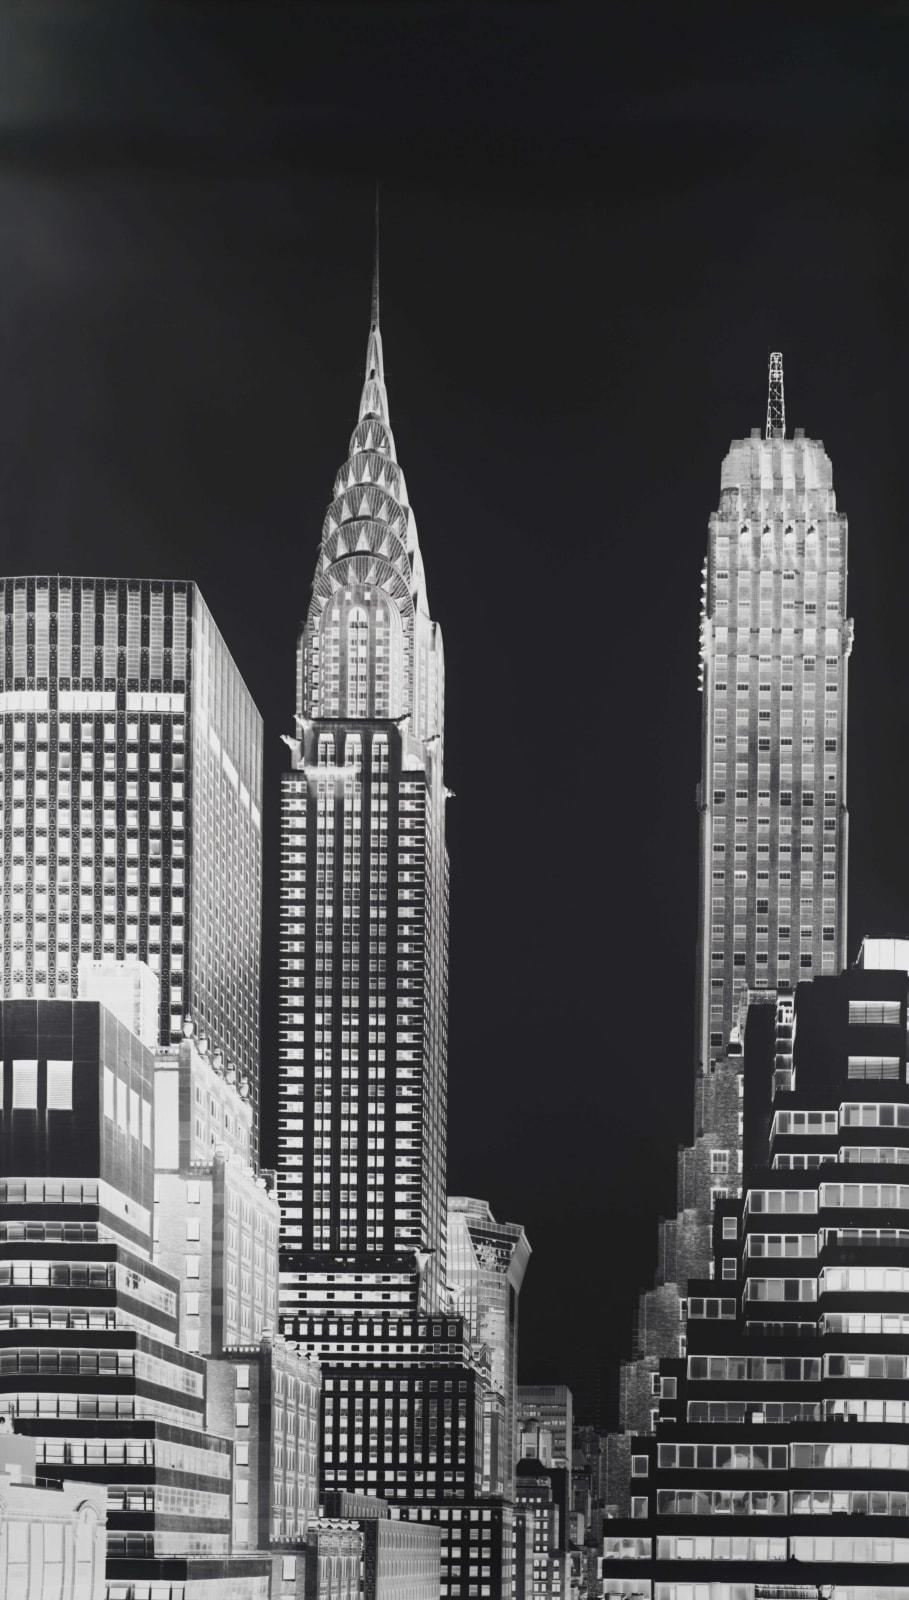 Vera Lutter, Chrysler Building, XII: June 29, 2016